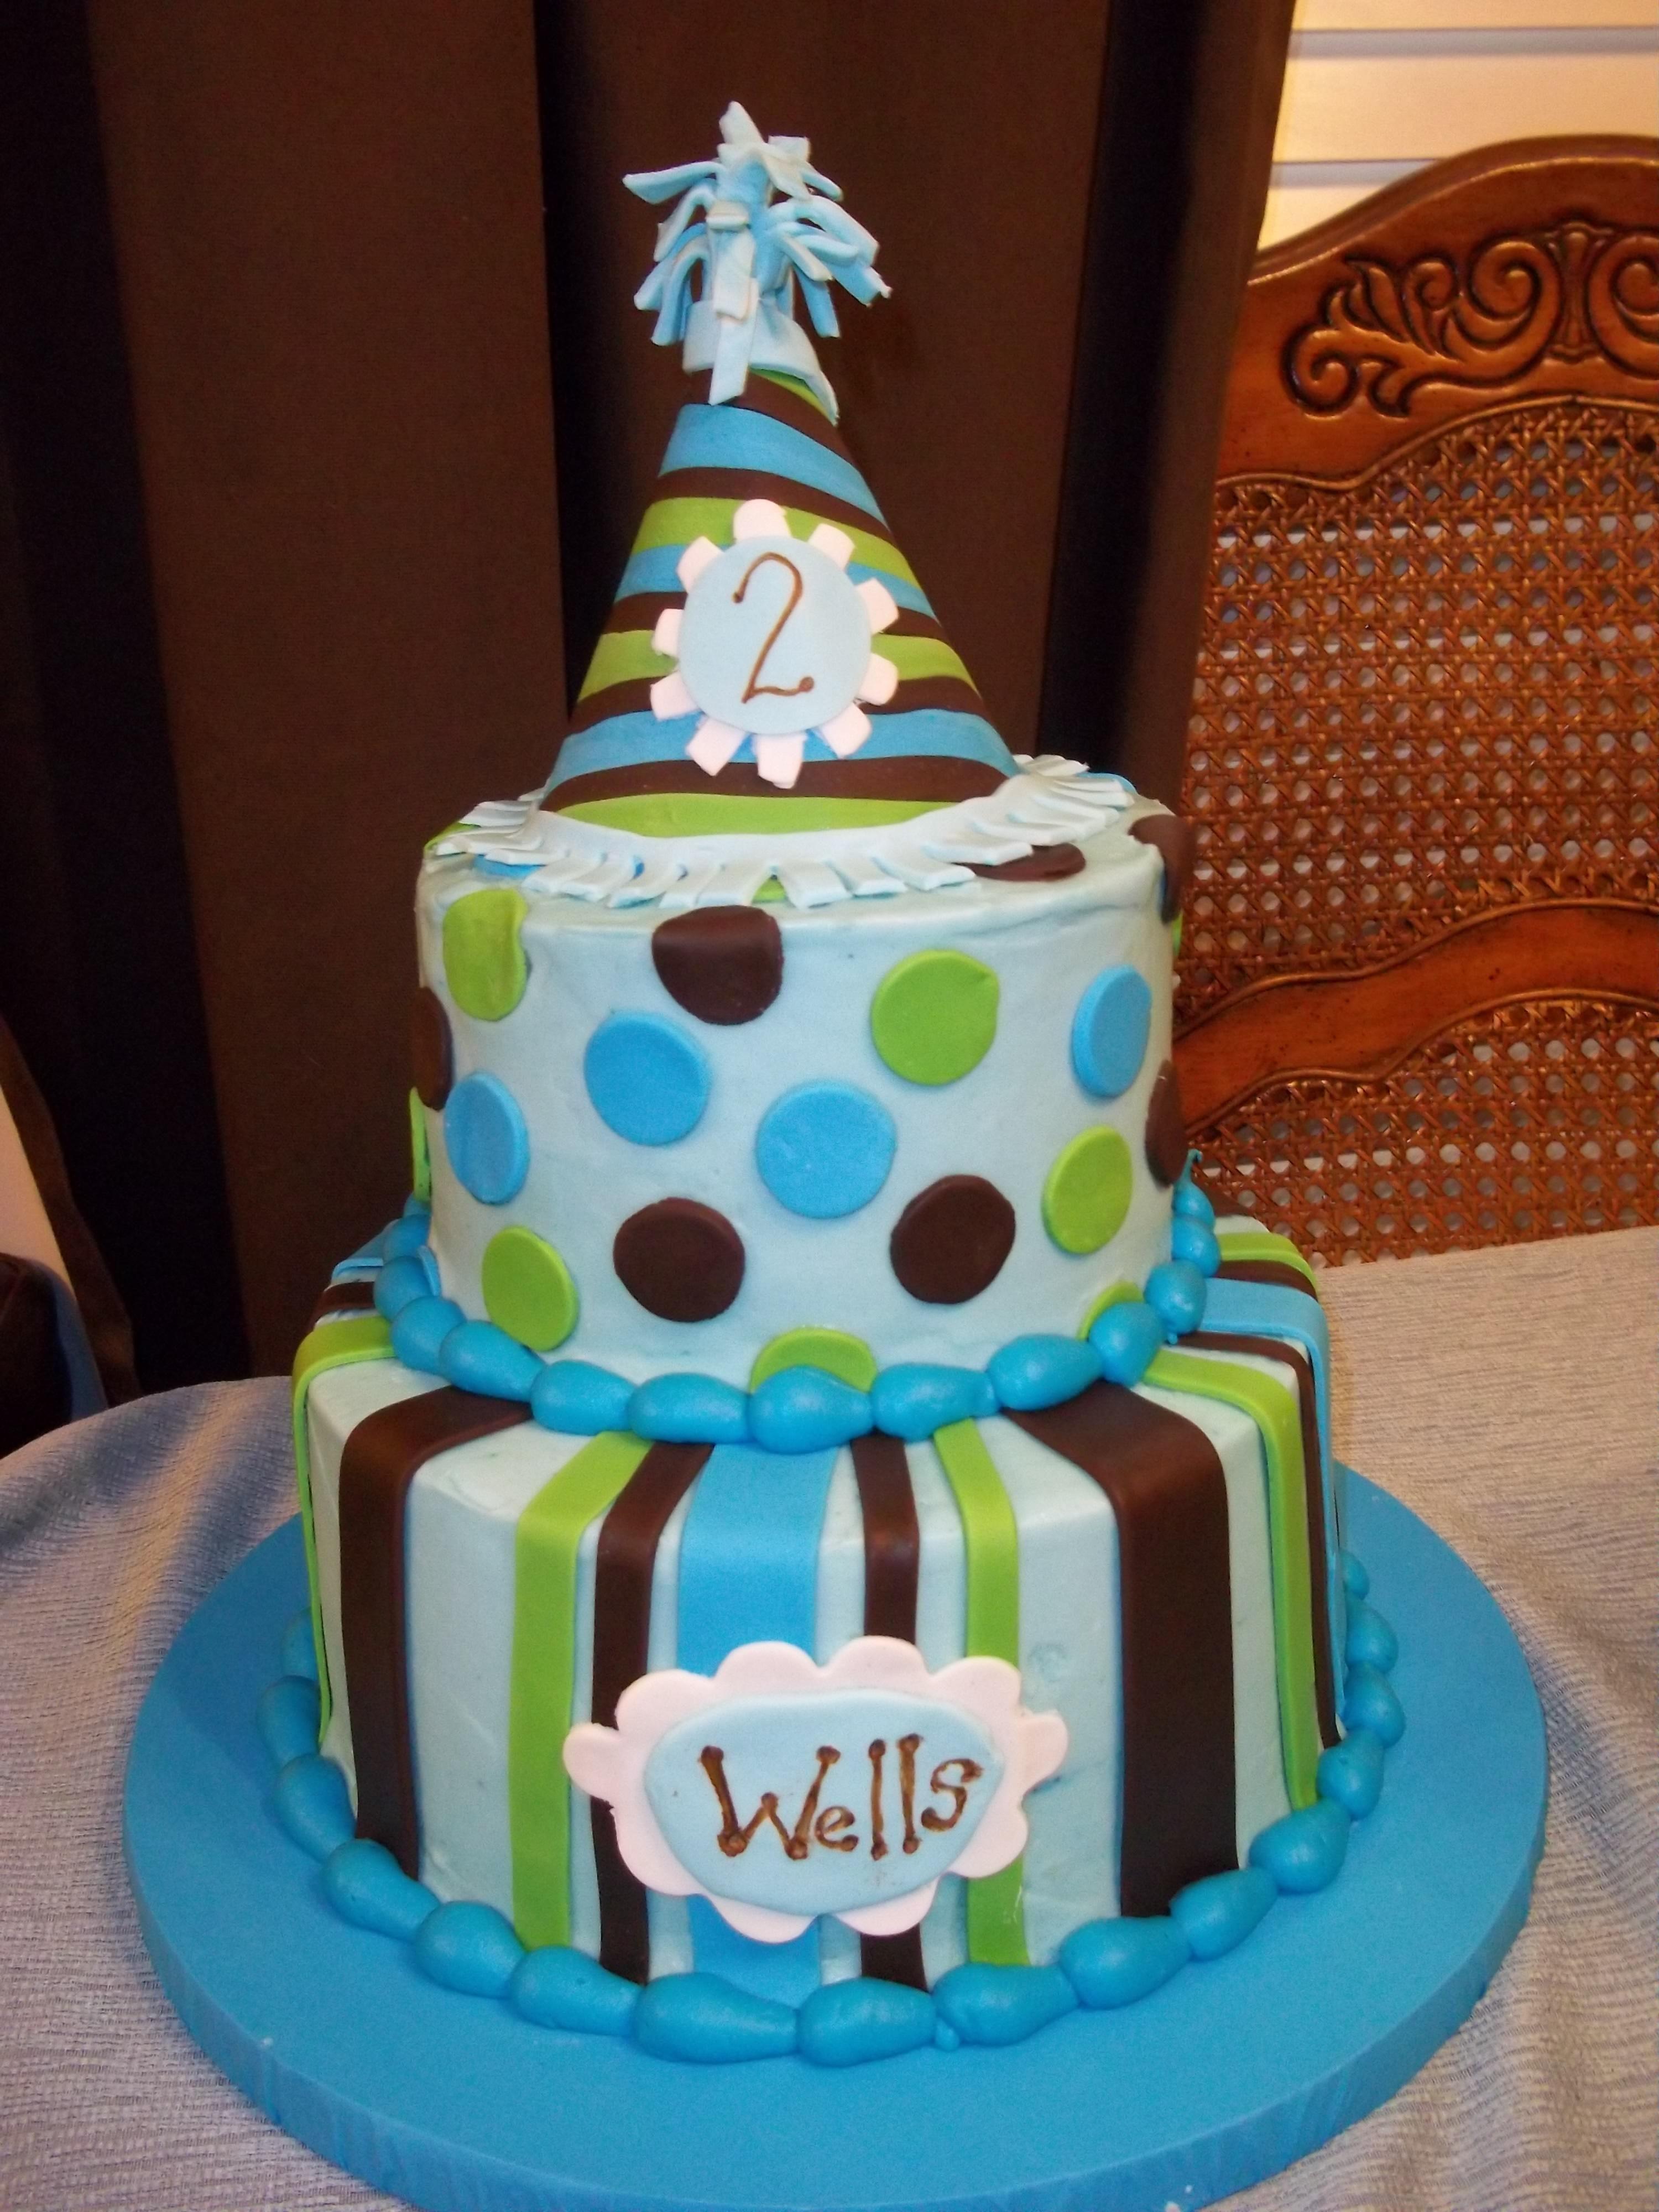 Some interesting kids birthday cake ideas different types of kids - Kid S Birthday Cake Birthdaycake